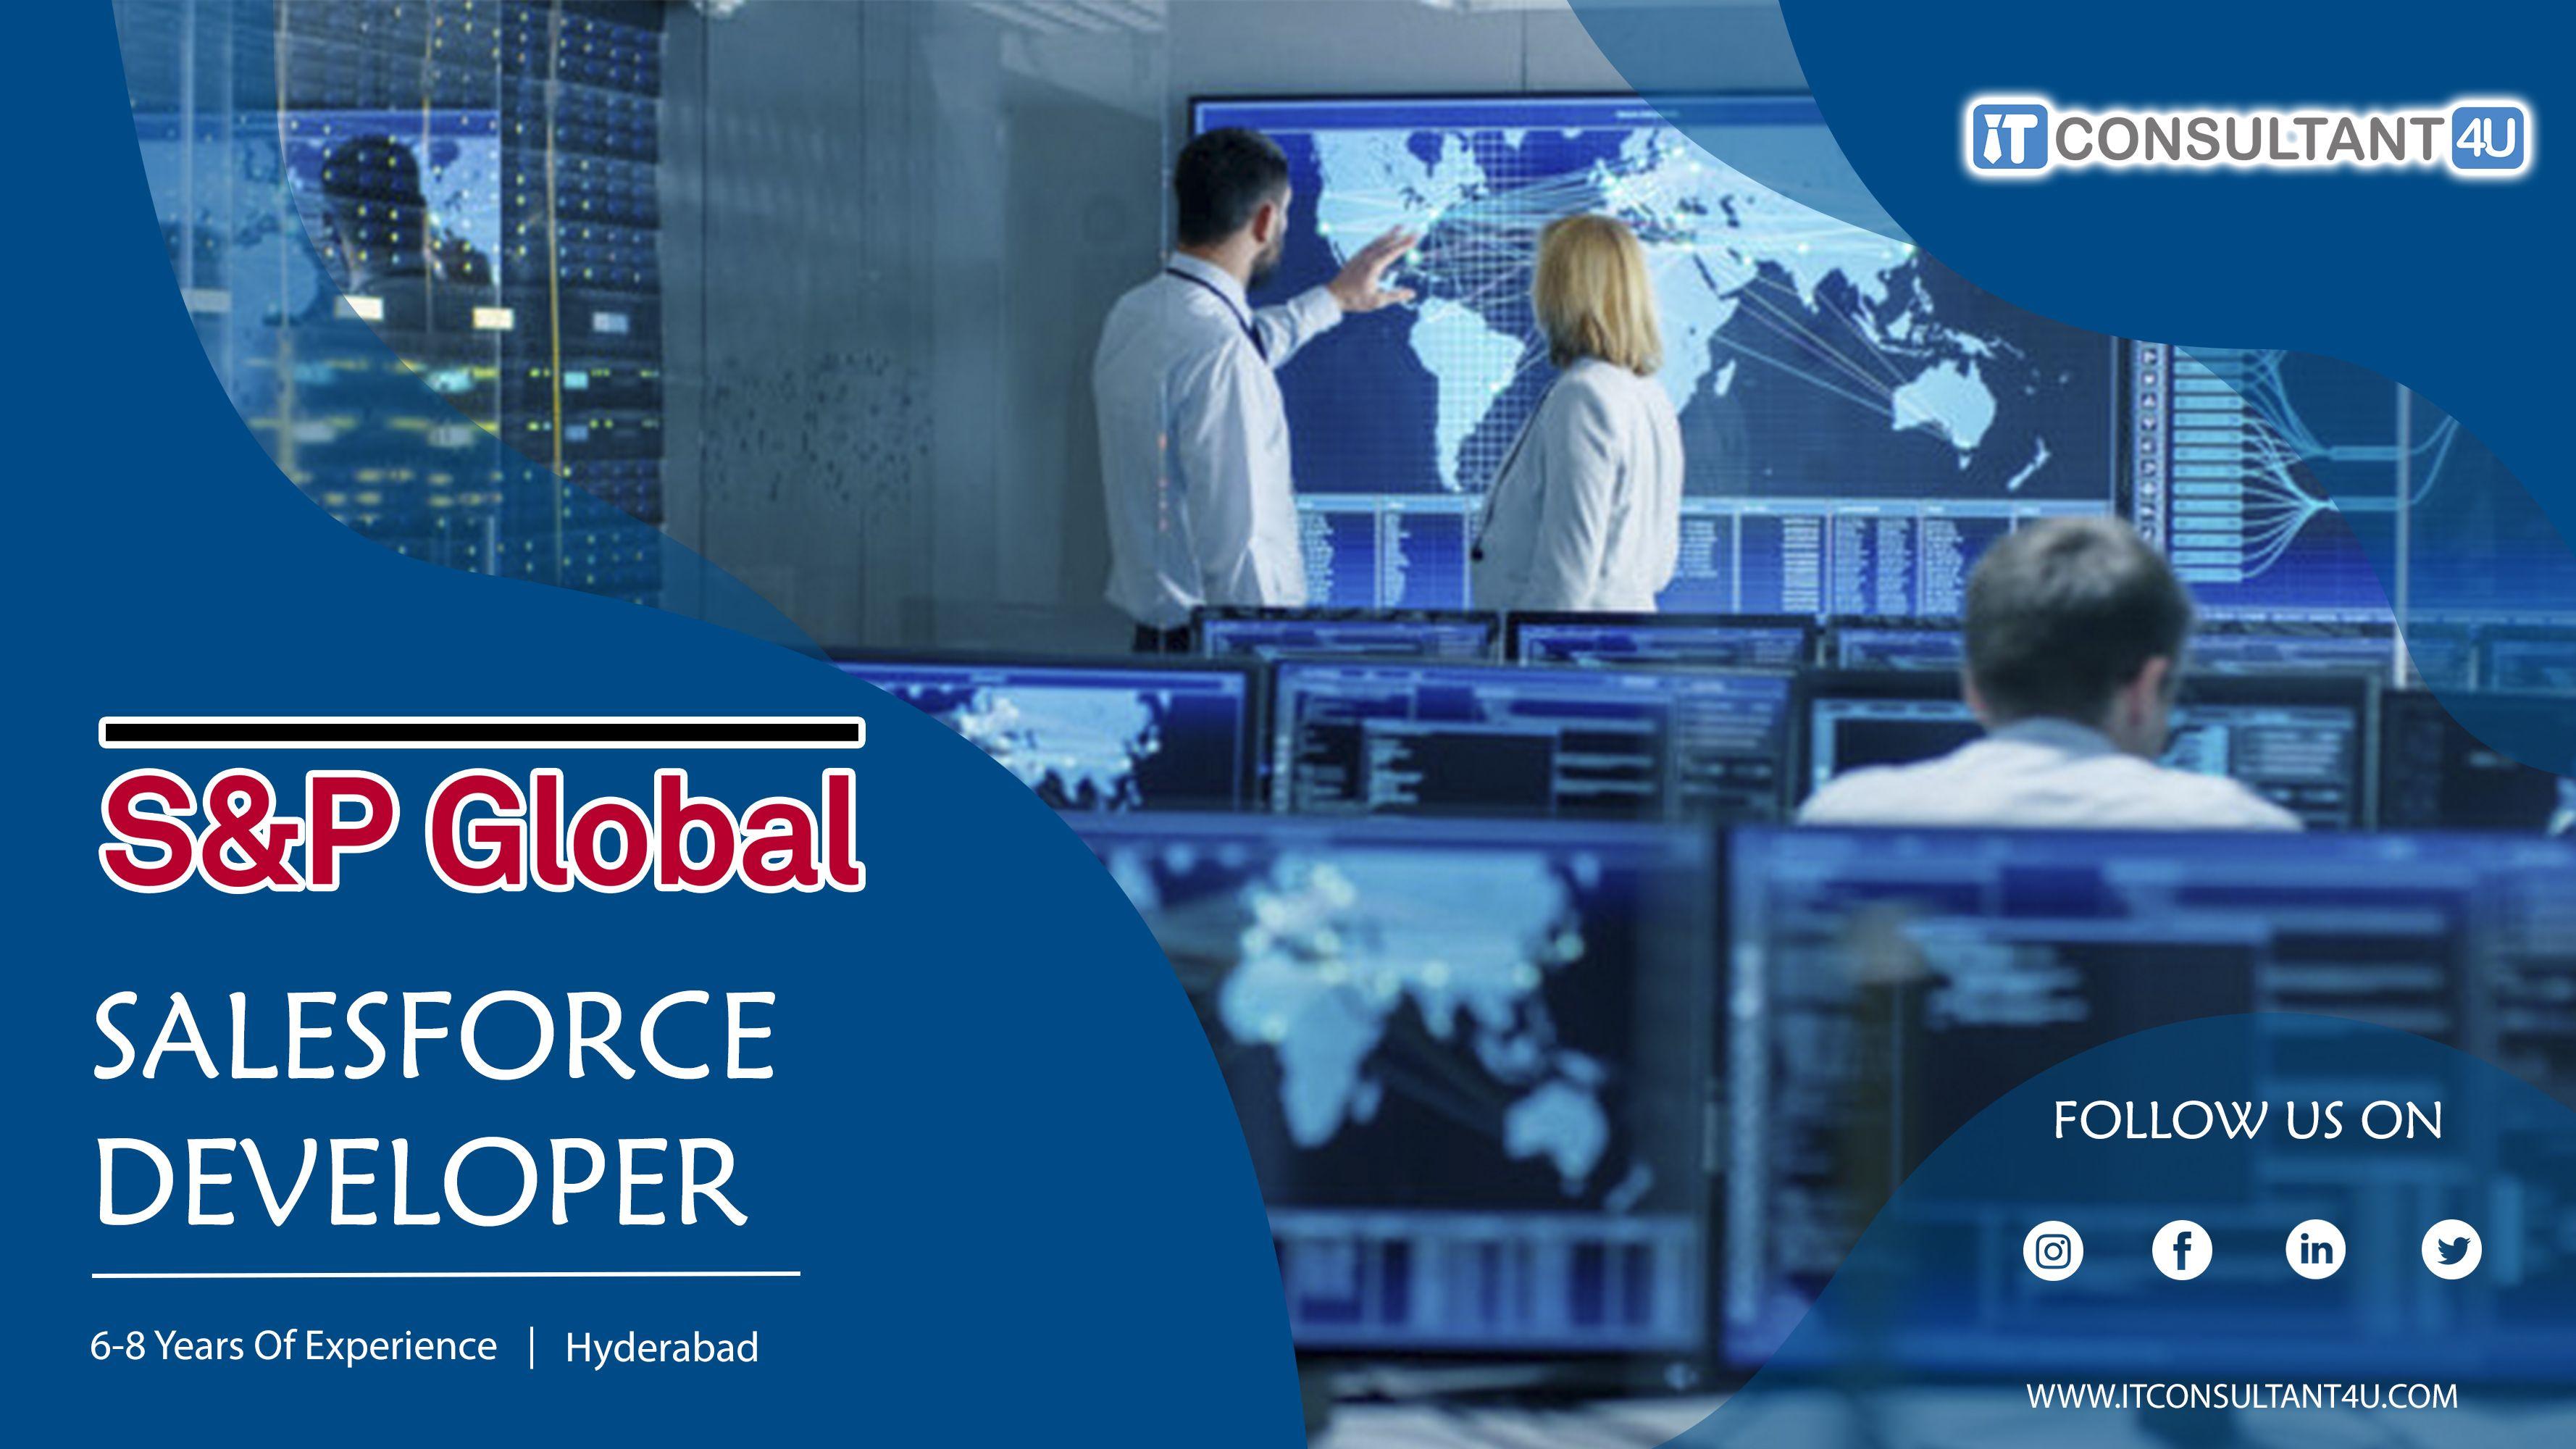 S P Global Is Hiring Salesforcedeveloper Itconsultant4u In 2020 Job Opening Help Finding A Job Job Posting